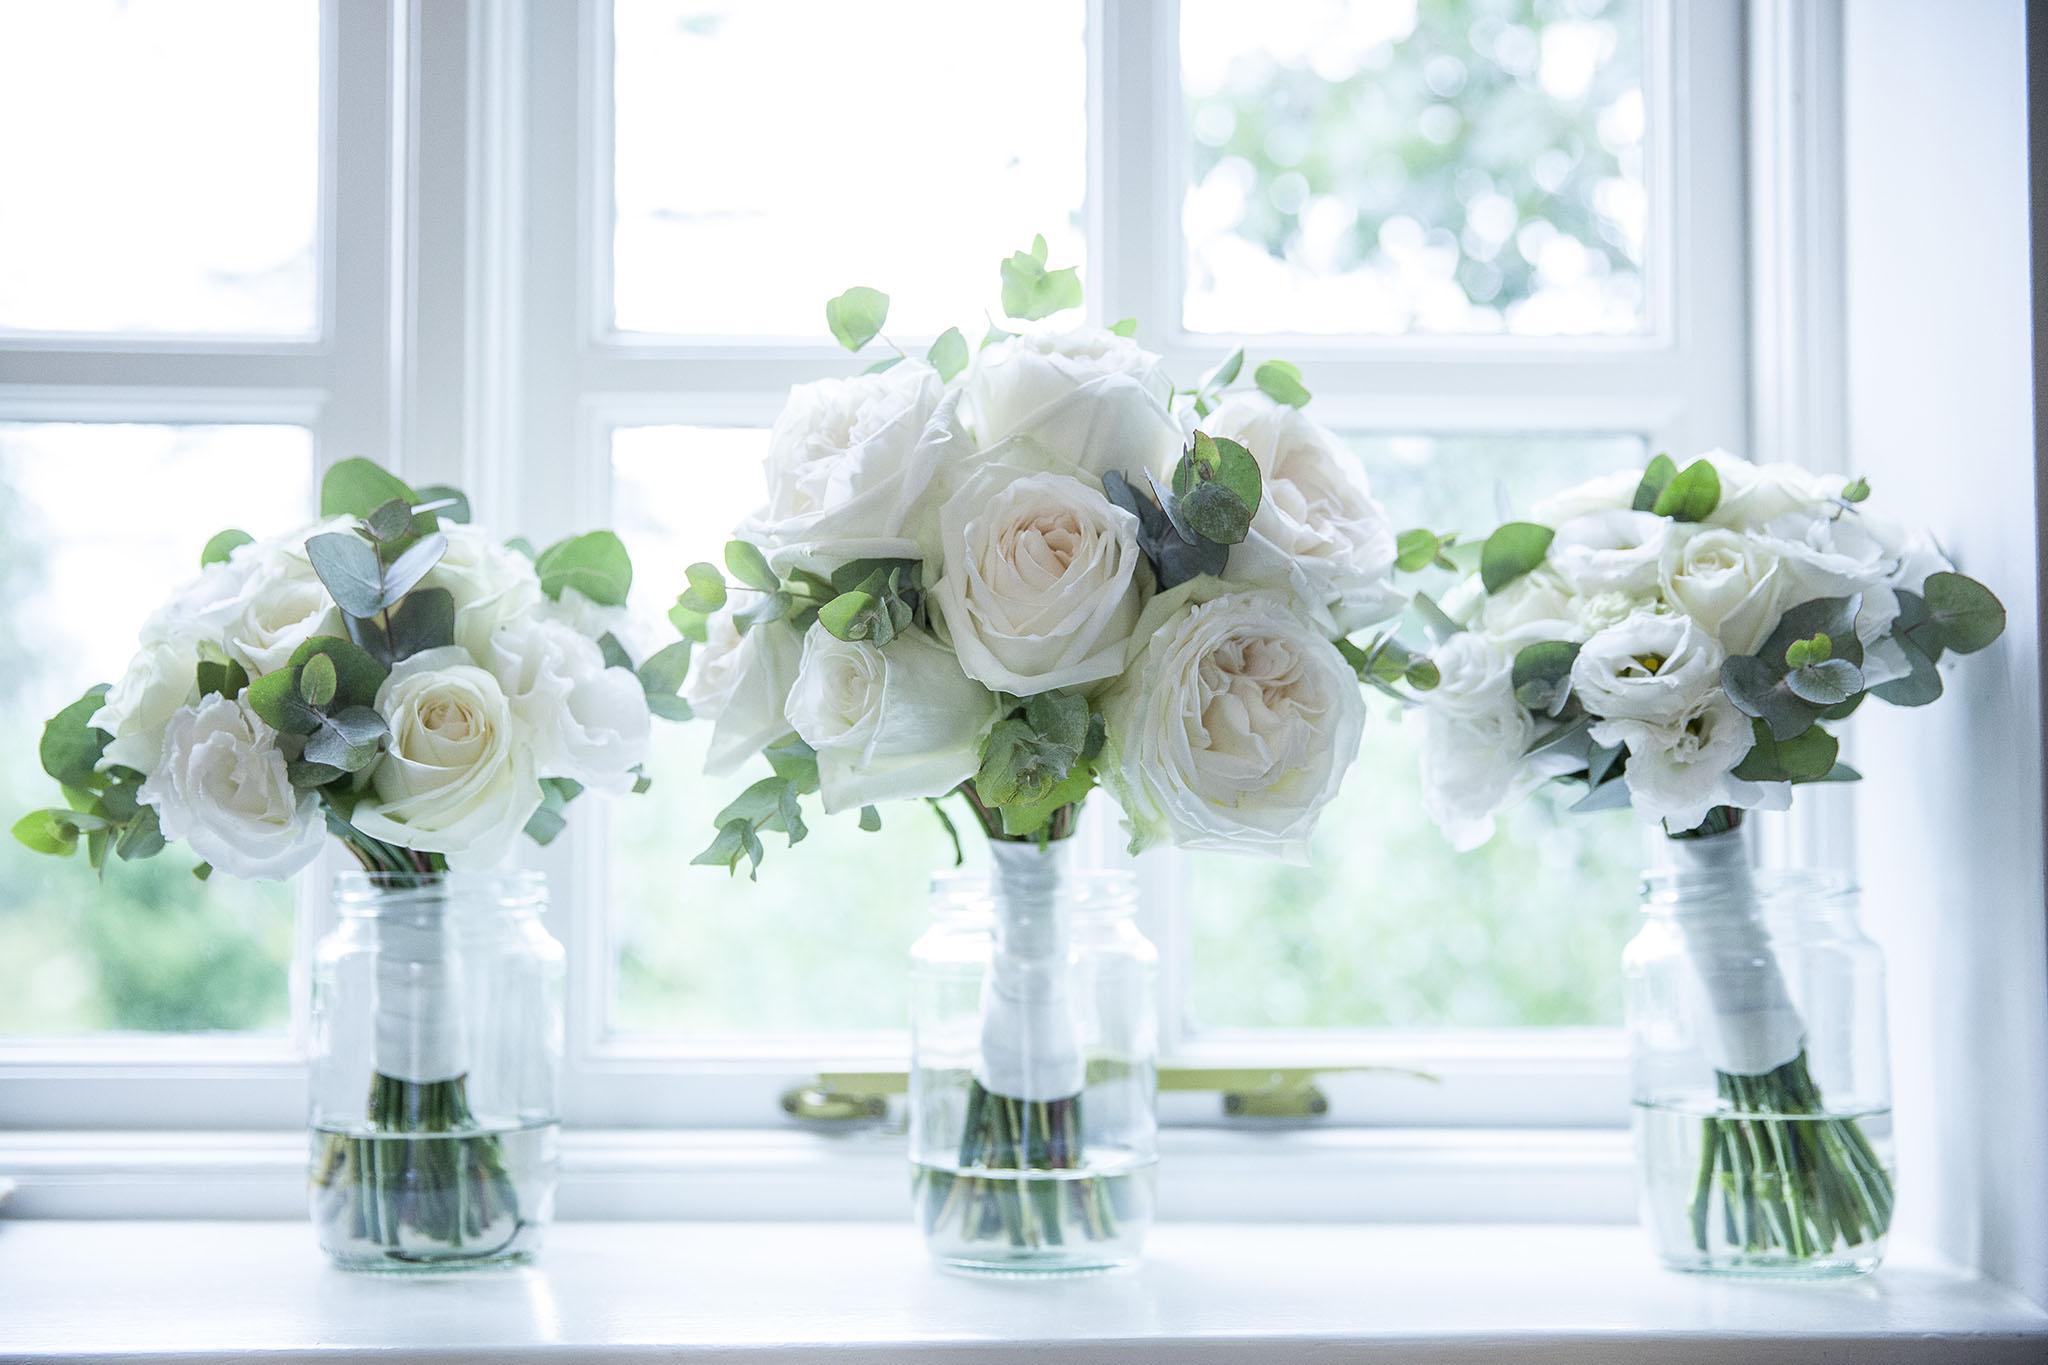 elizabethg_photography_hertfordshire_fineart_photographer_tonycharlie_wedding_photography_aldermaston_wasing_park_reading_06.jpg